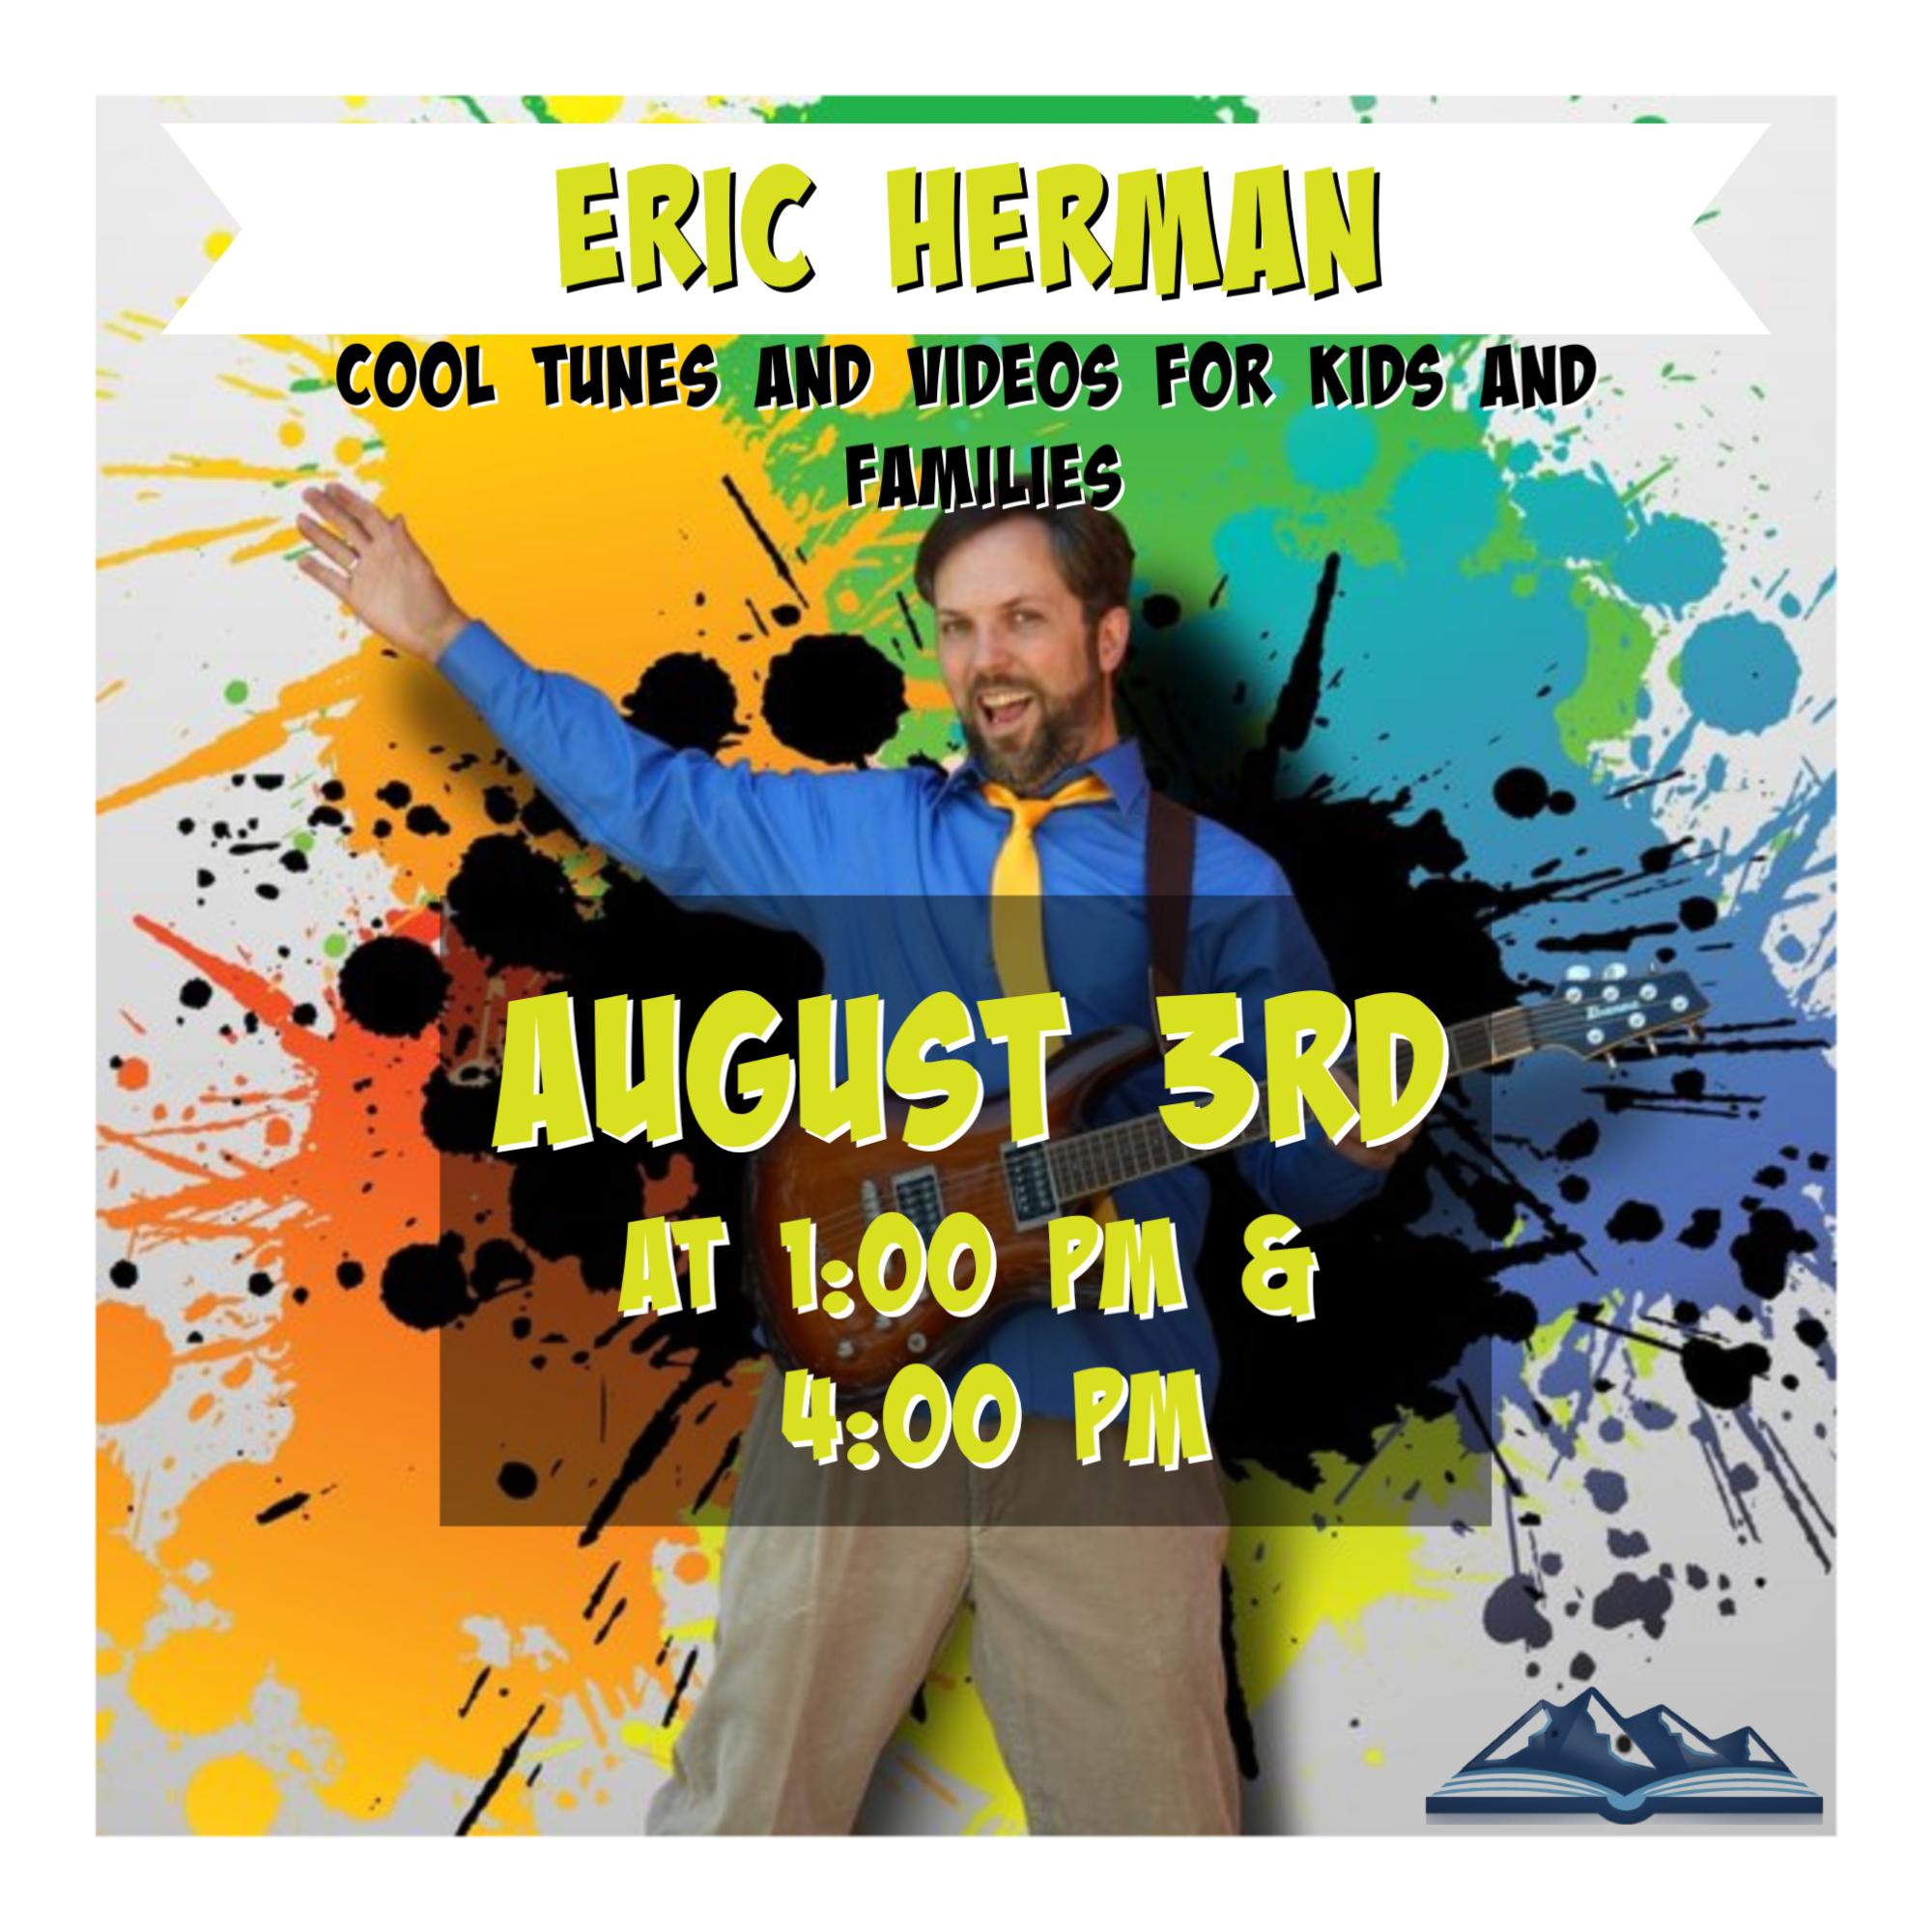 Eric Herman Music Concert